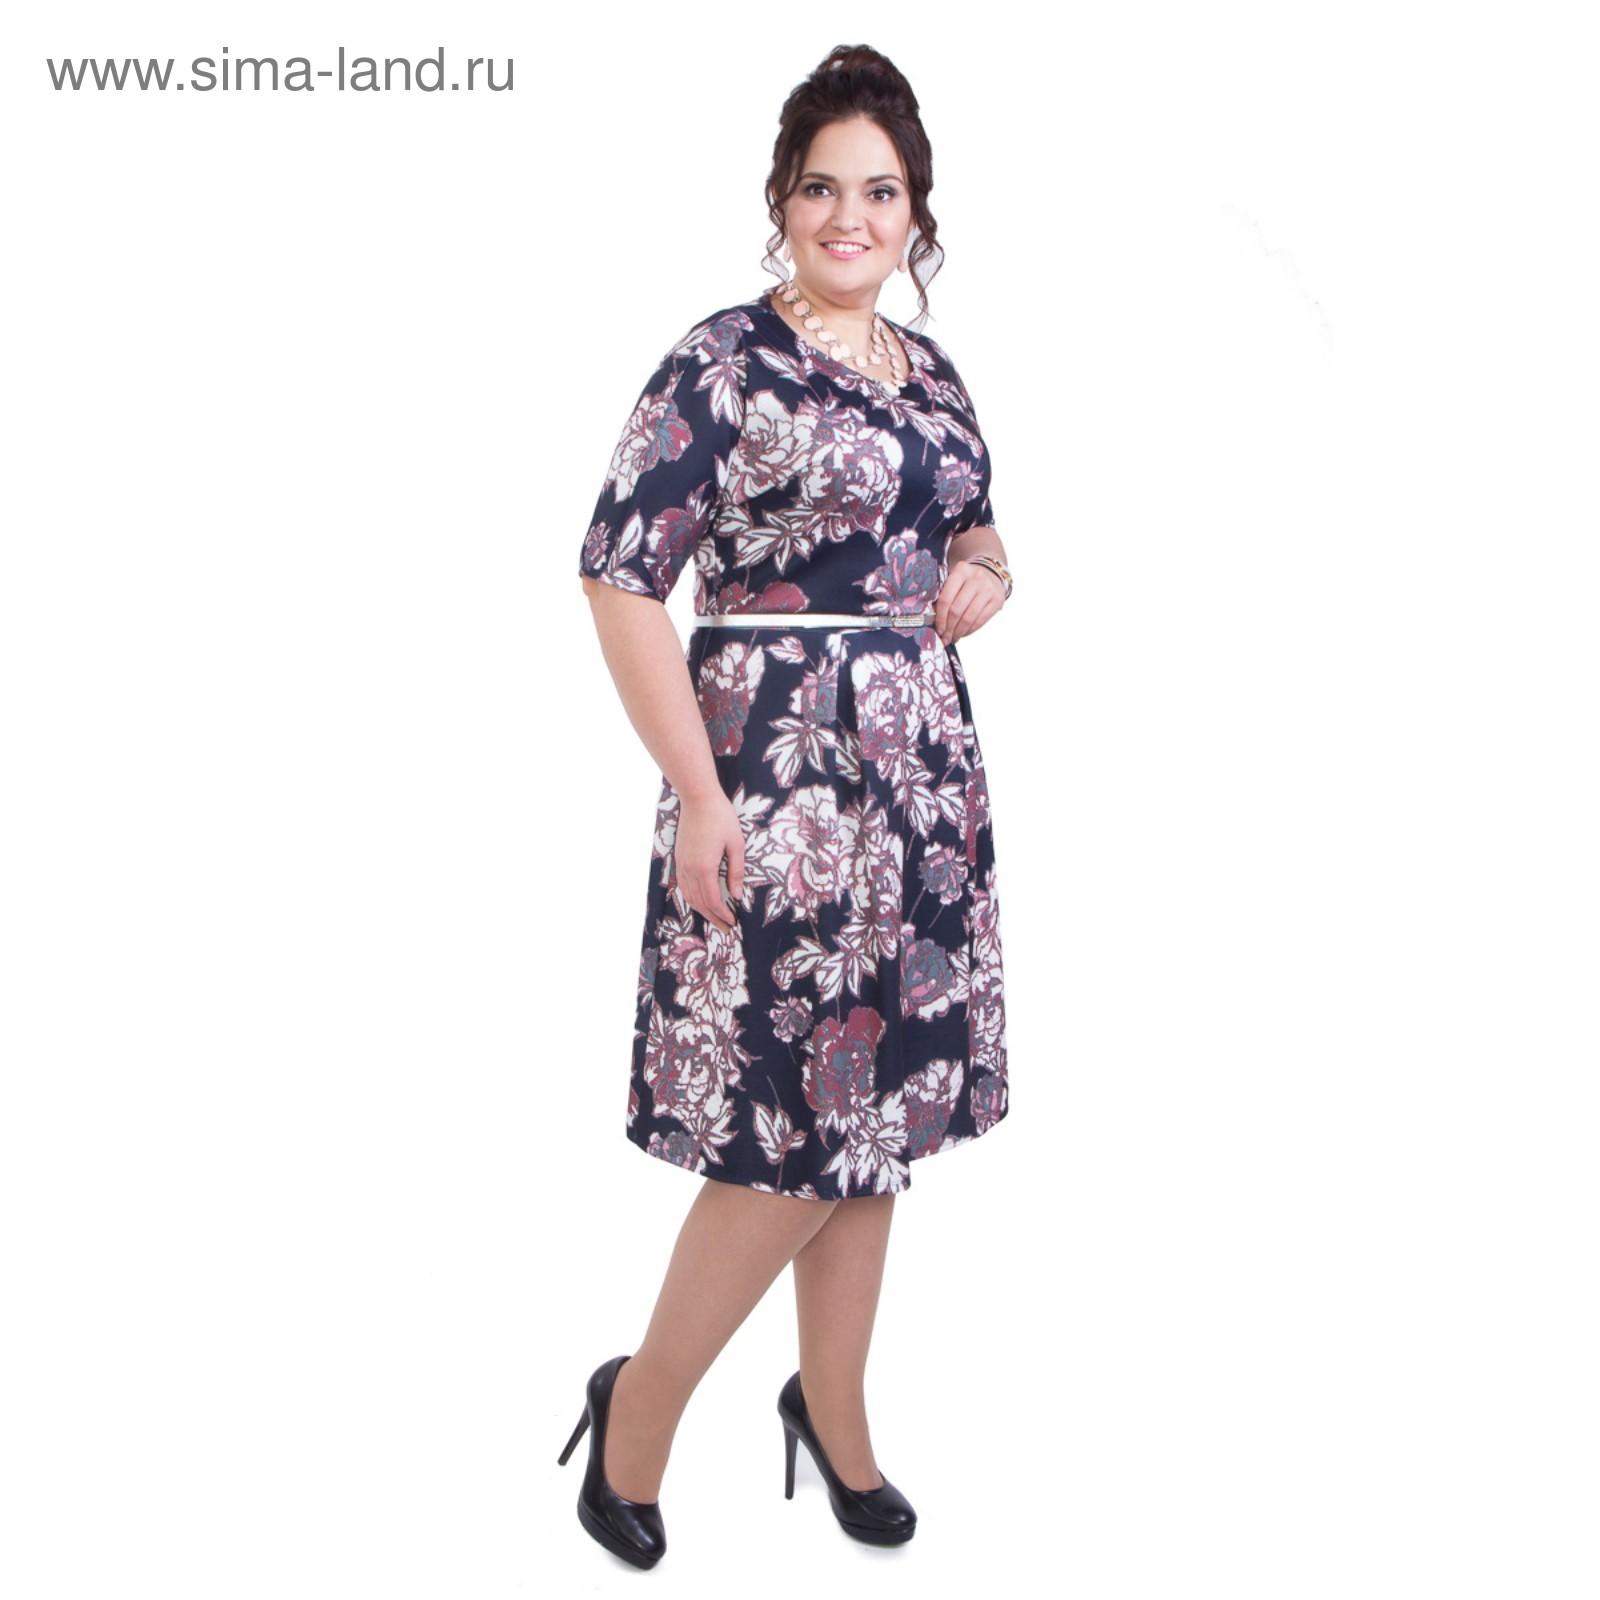 9a87ed82a42 Платье женское